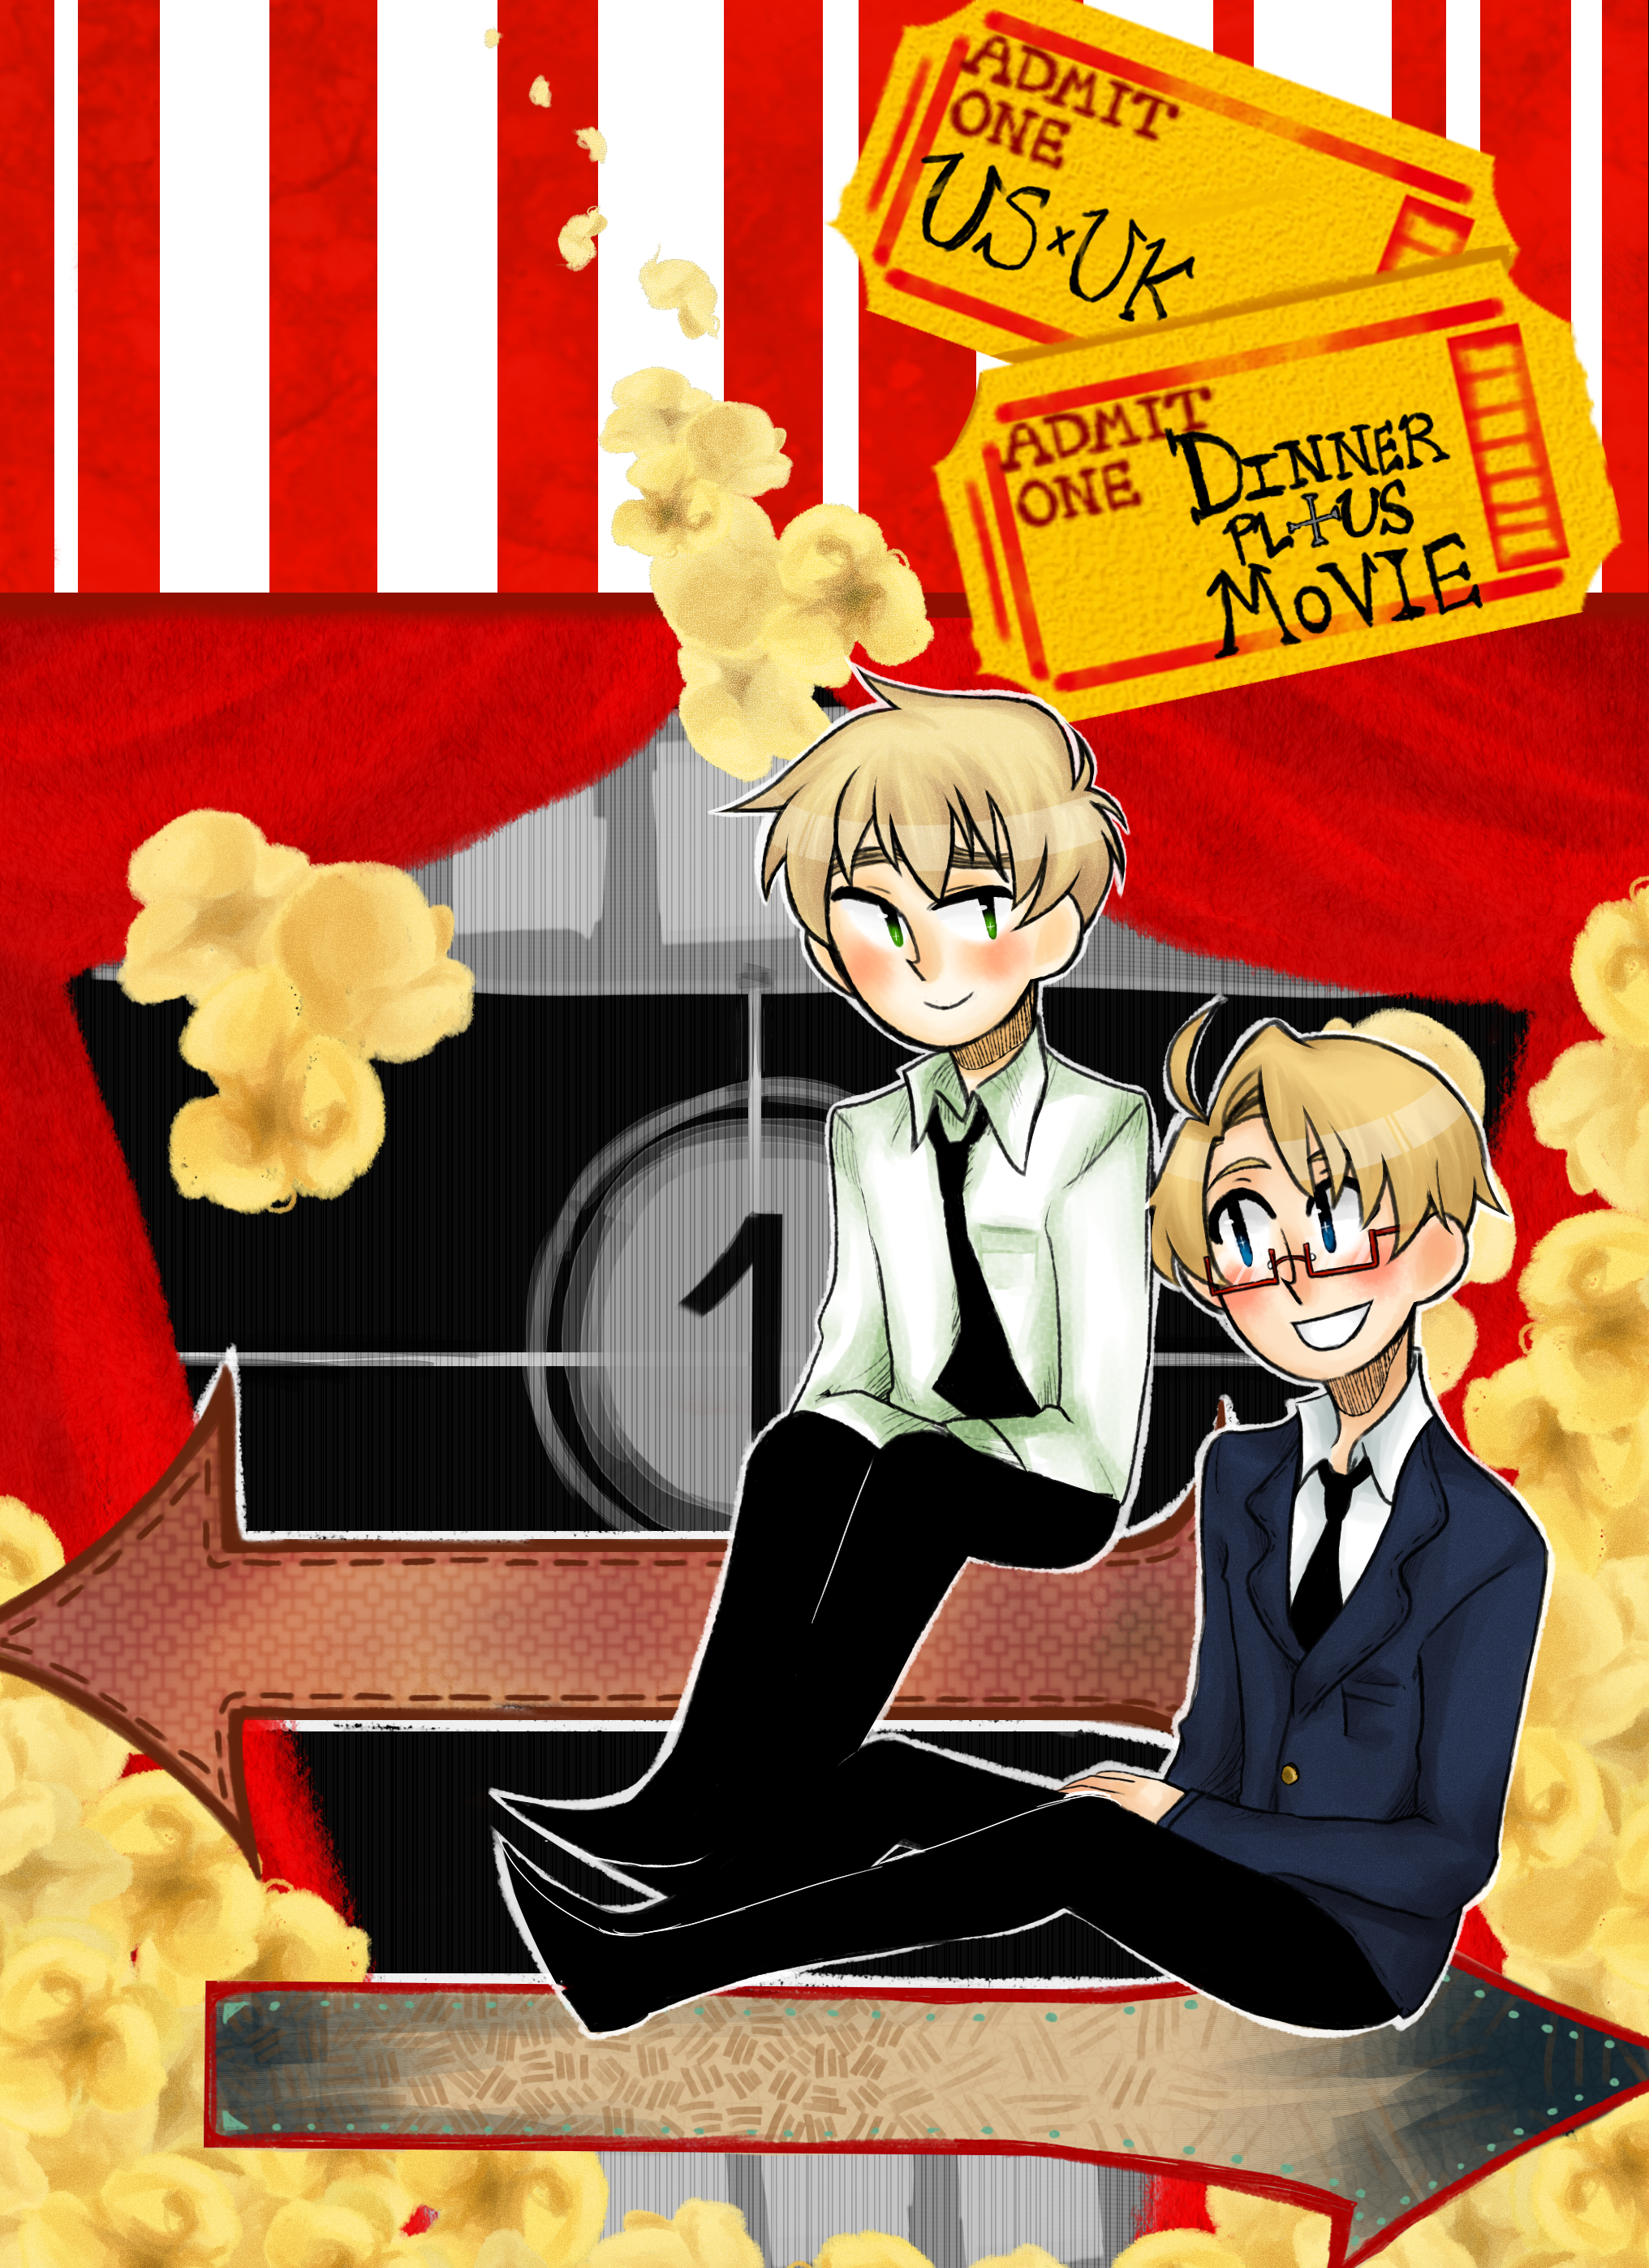 USUK Anthology Fanart-Dinner Plus Movie by Xxnarutogrl6xX